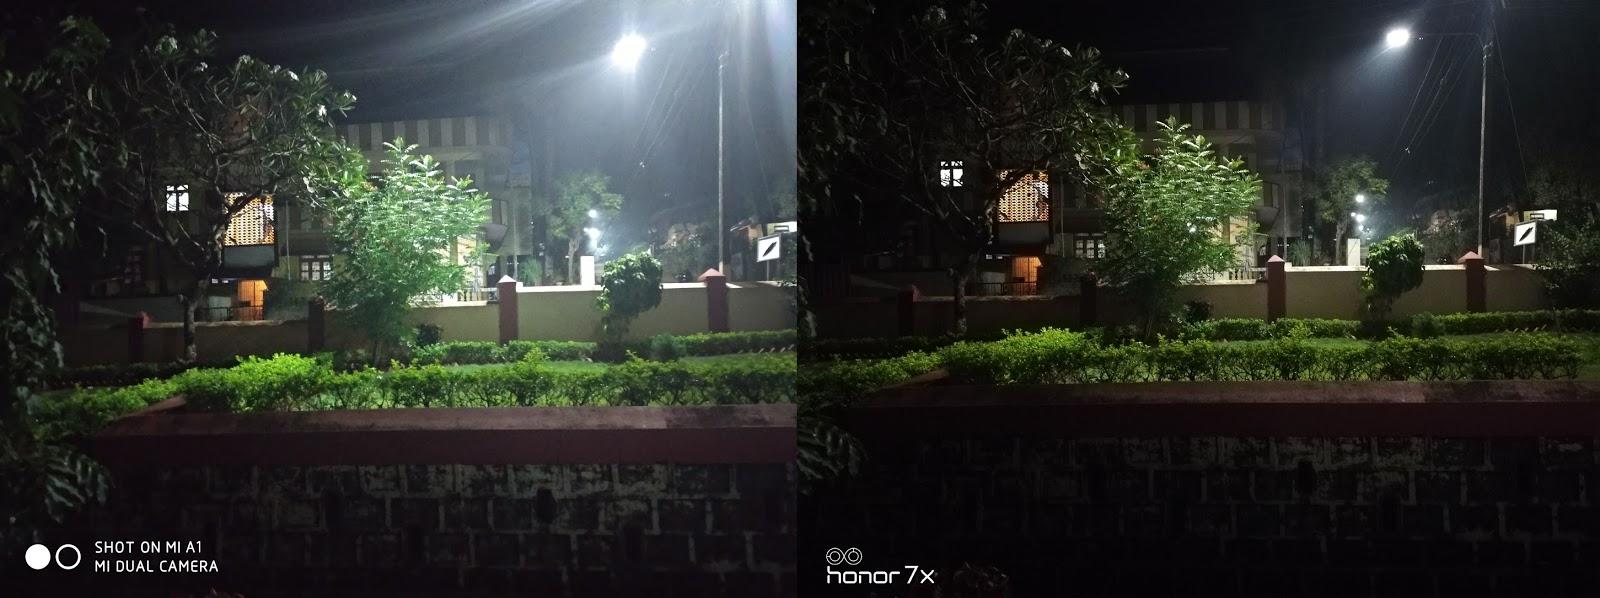 Xiaomi Mi A1 Vs Honor 7x Camera Comparison Tech Updates